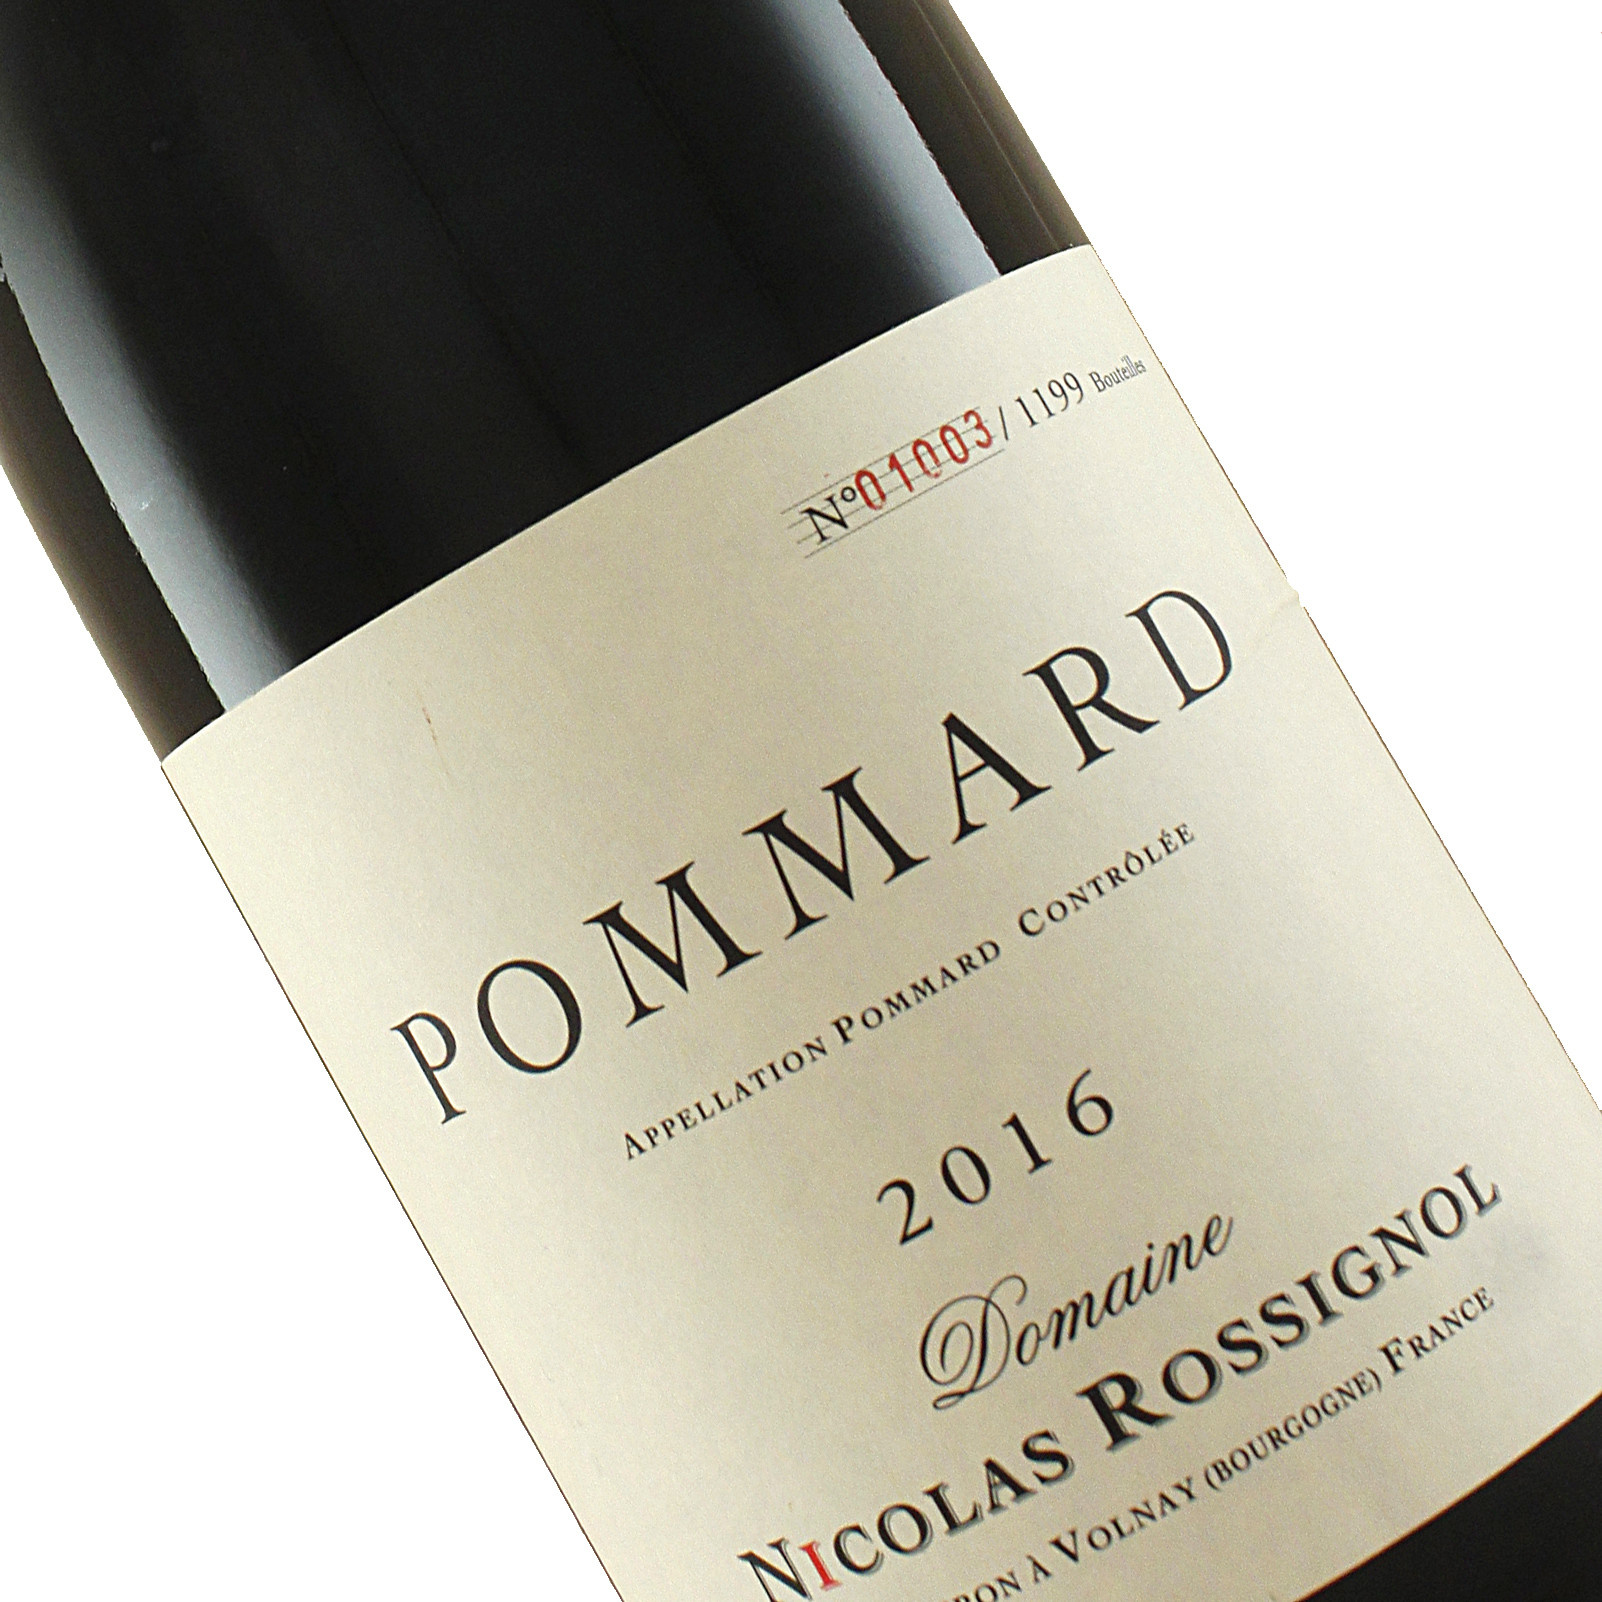 Domaine Nicolas Rossignol 2016 Pommard 1er Cru, Burgundy